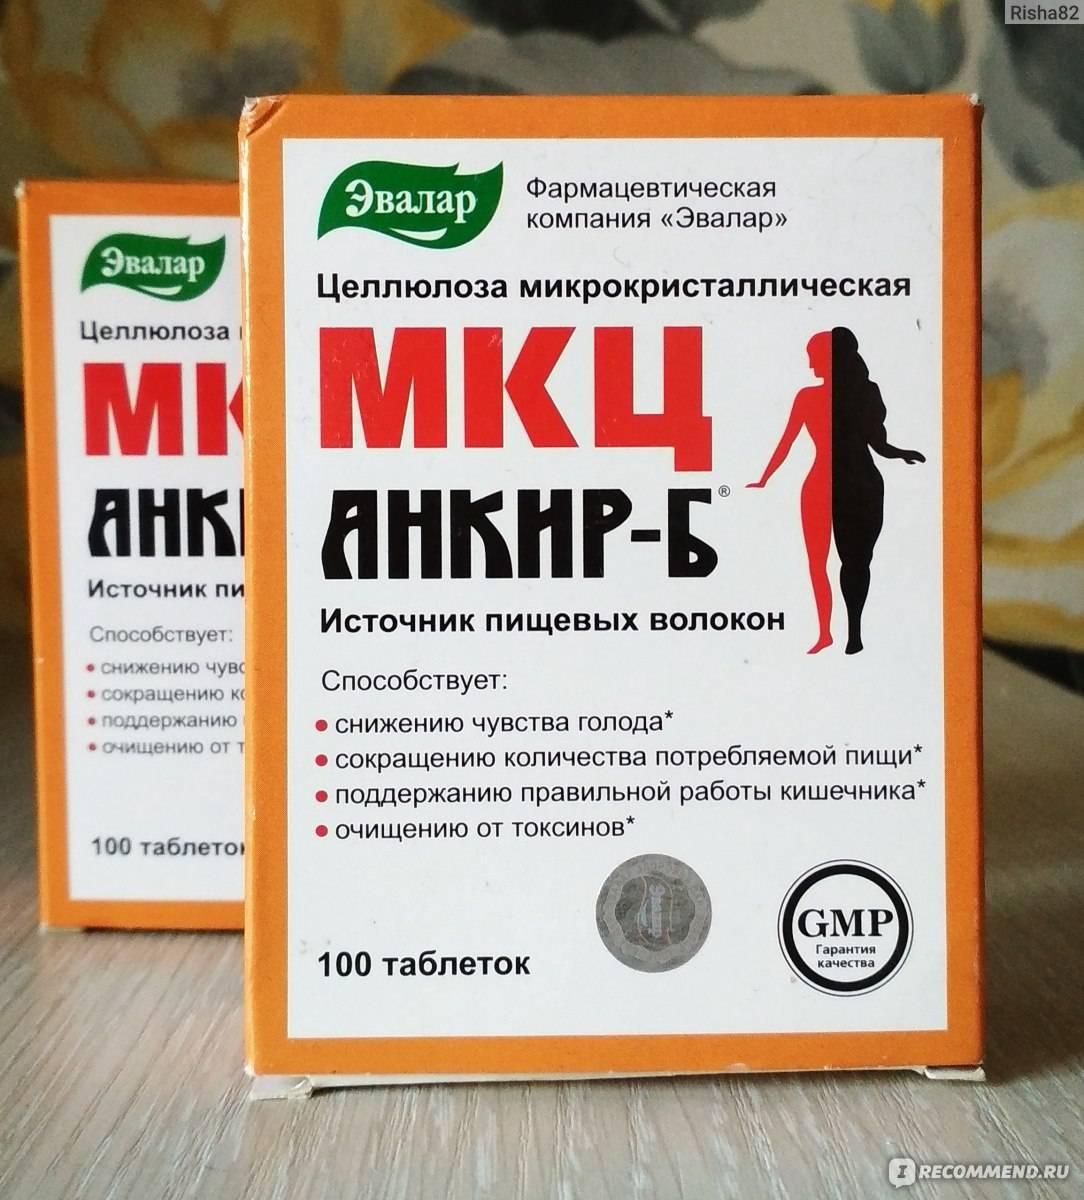 Отзывы похудевших о препарате мкц «анкир-б »